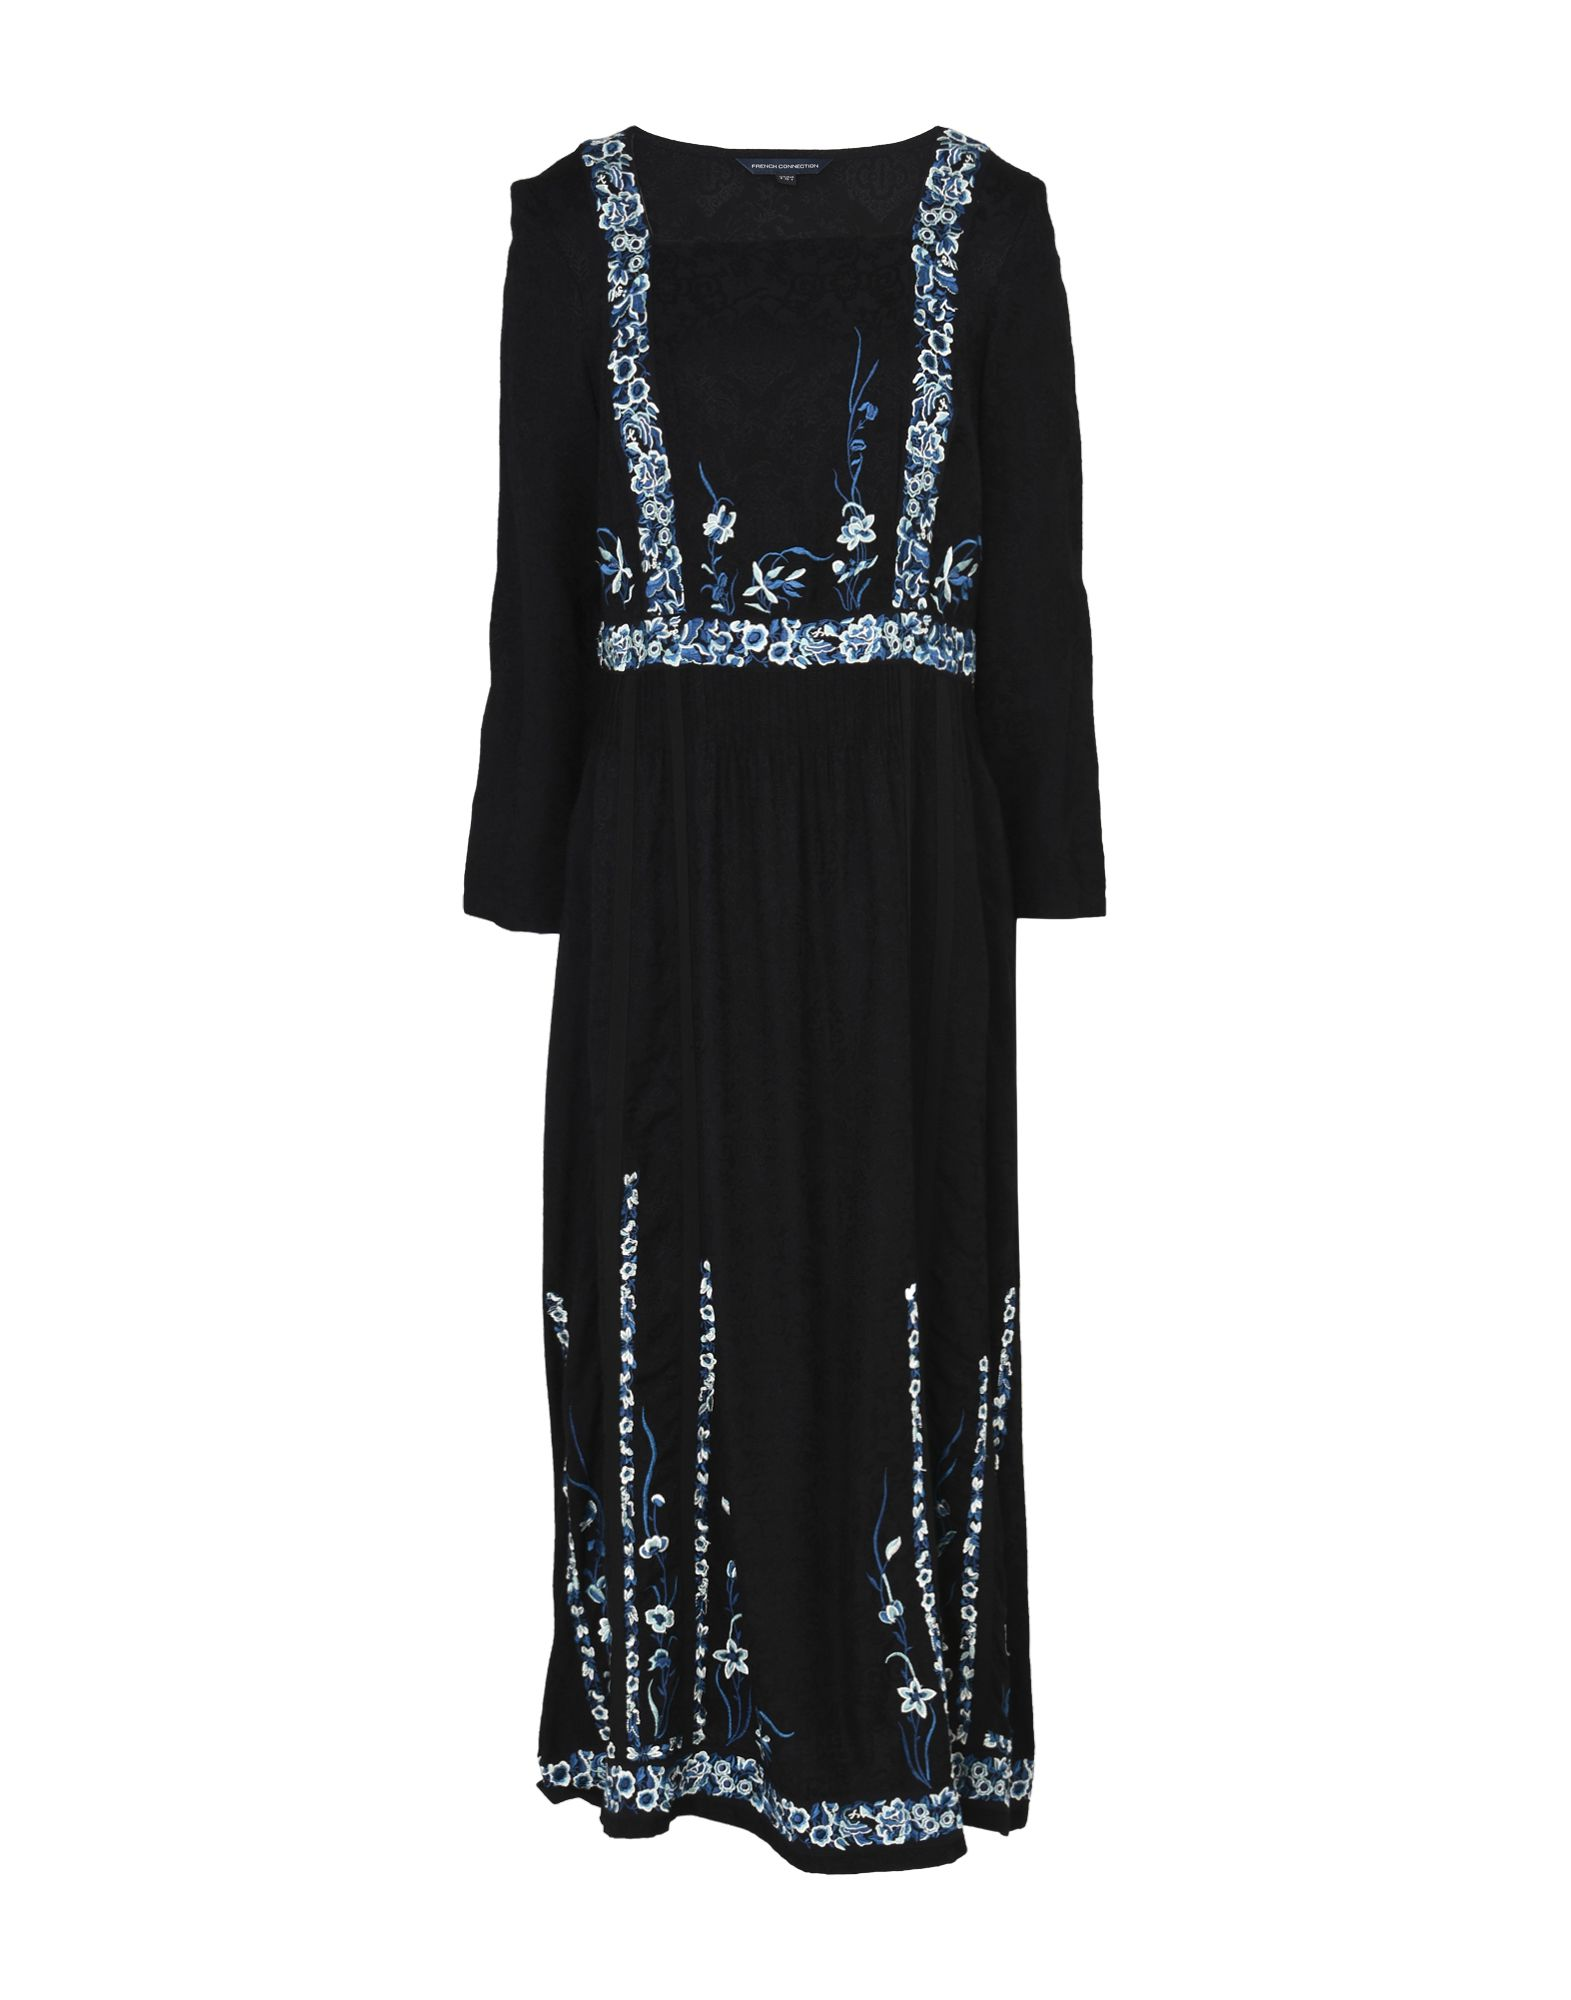 FRENCH CONNECTION Платье длиной 3/4 lisa corti платье длиной 3 4